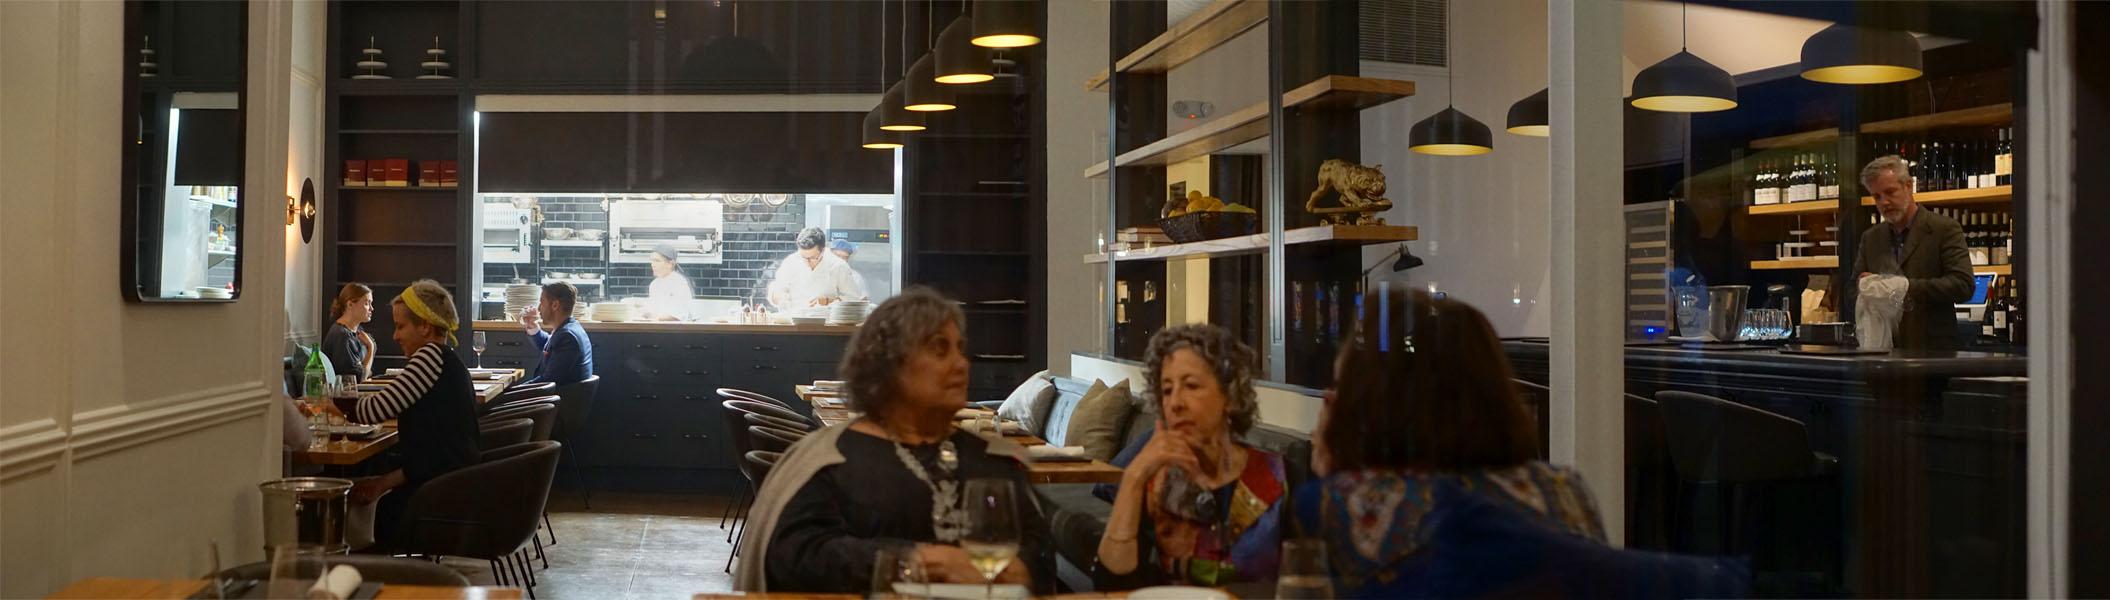 Peeking Into Kass Wine Bar + Restaurant Dining Room